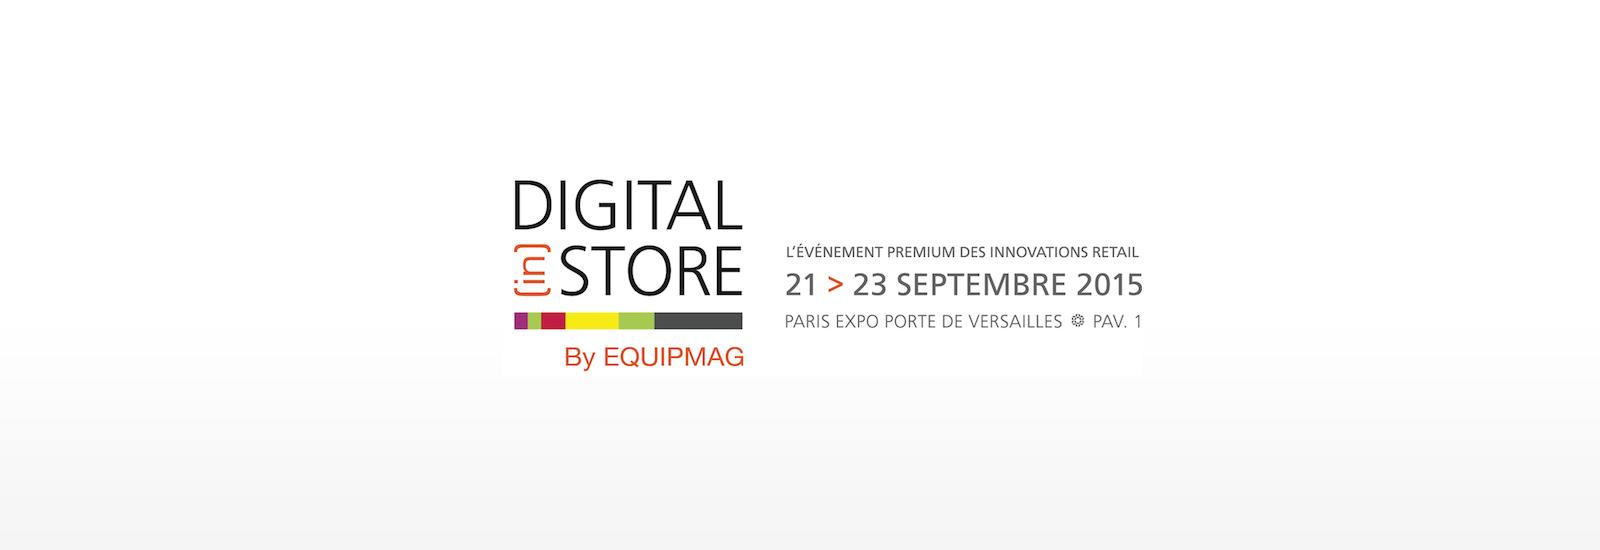 Salon Digital Instore 2015